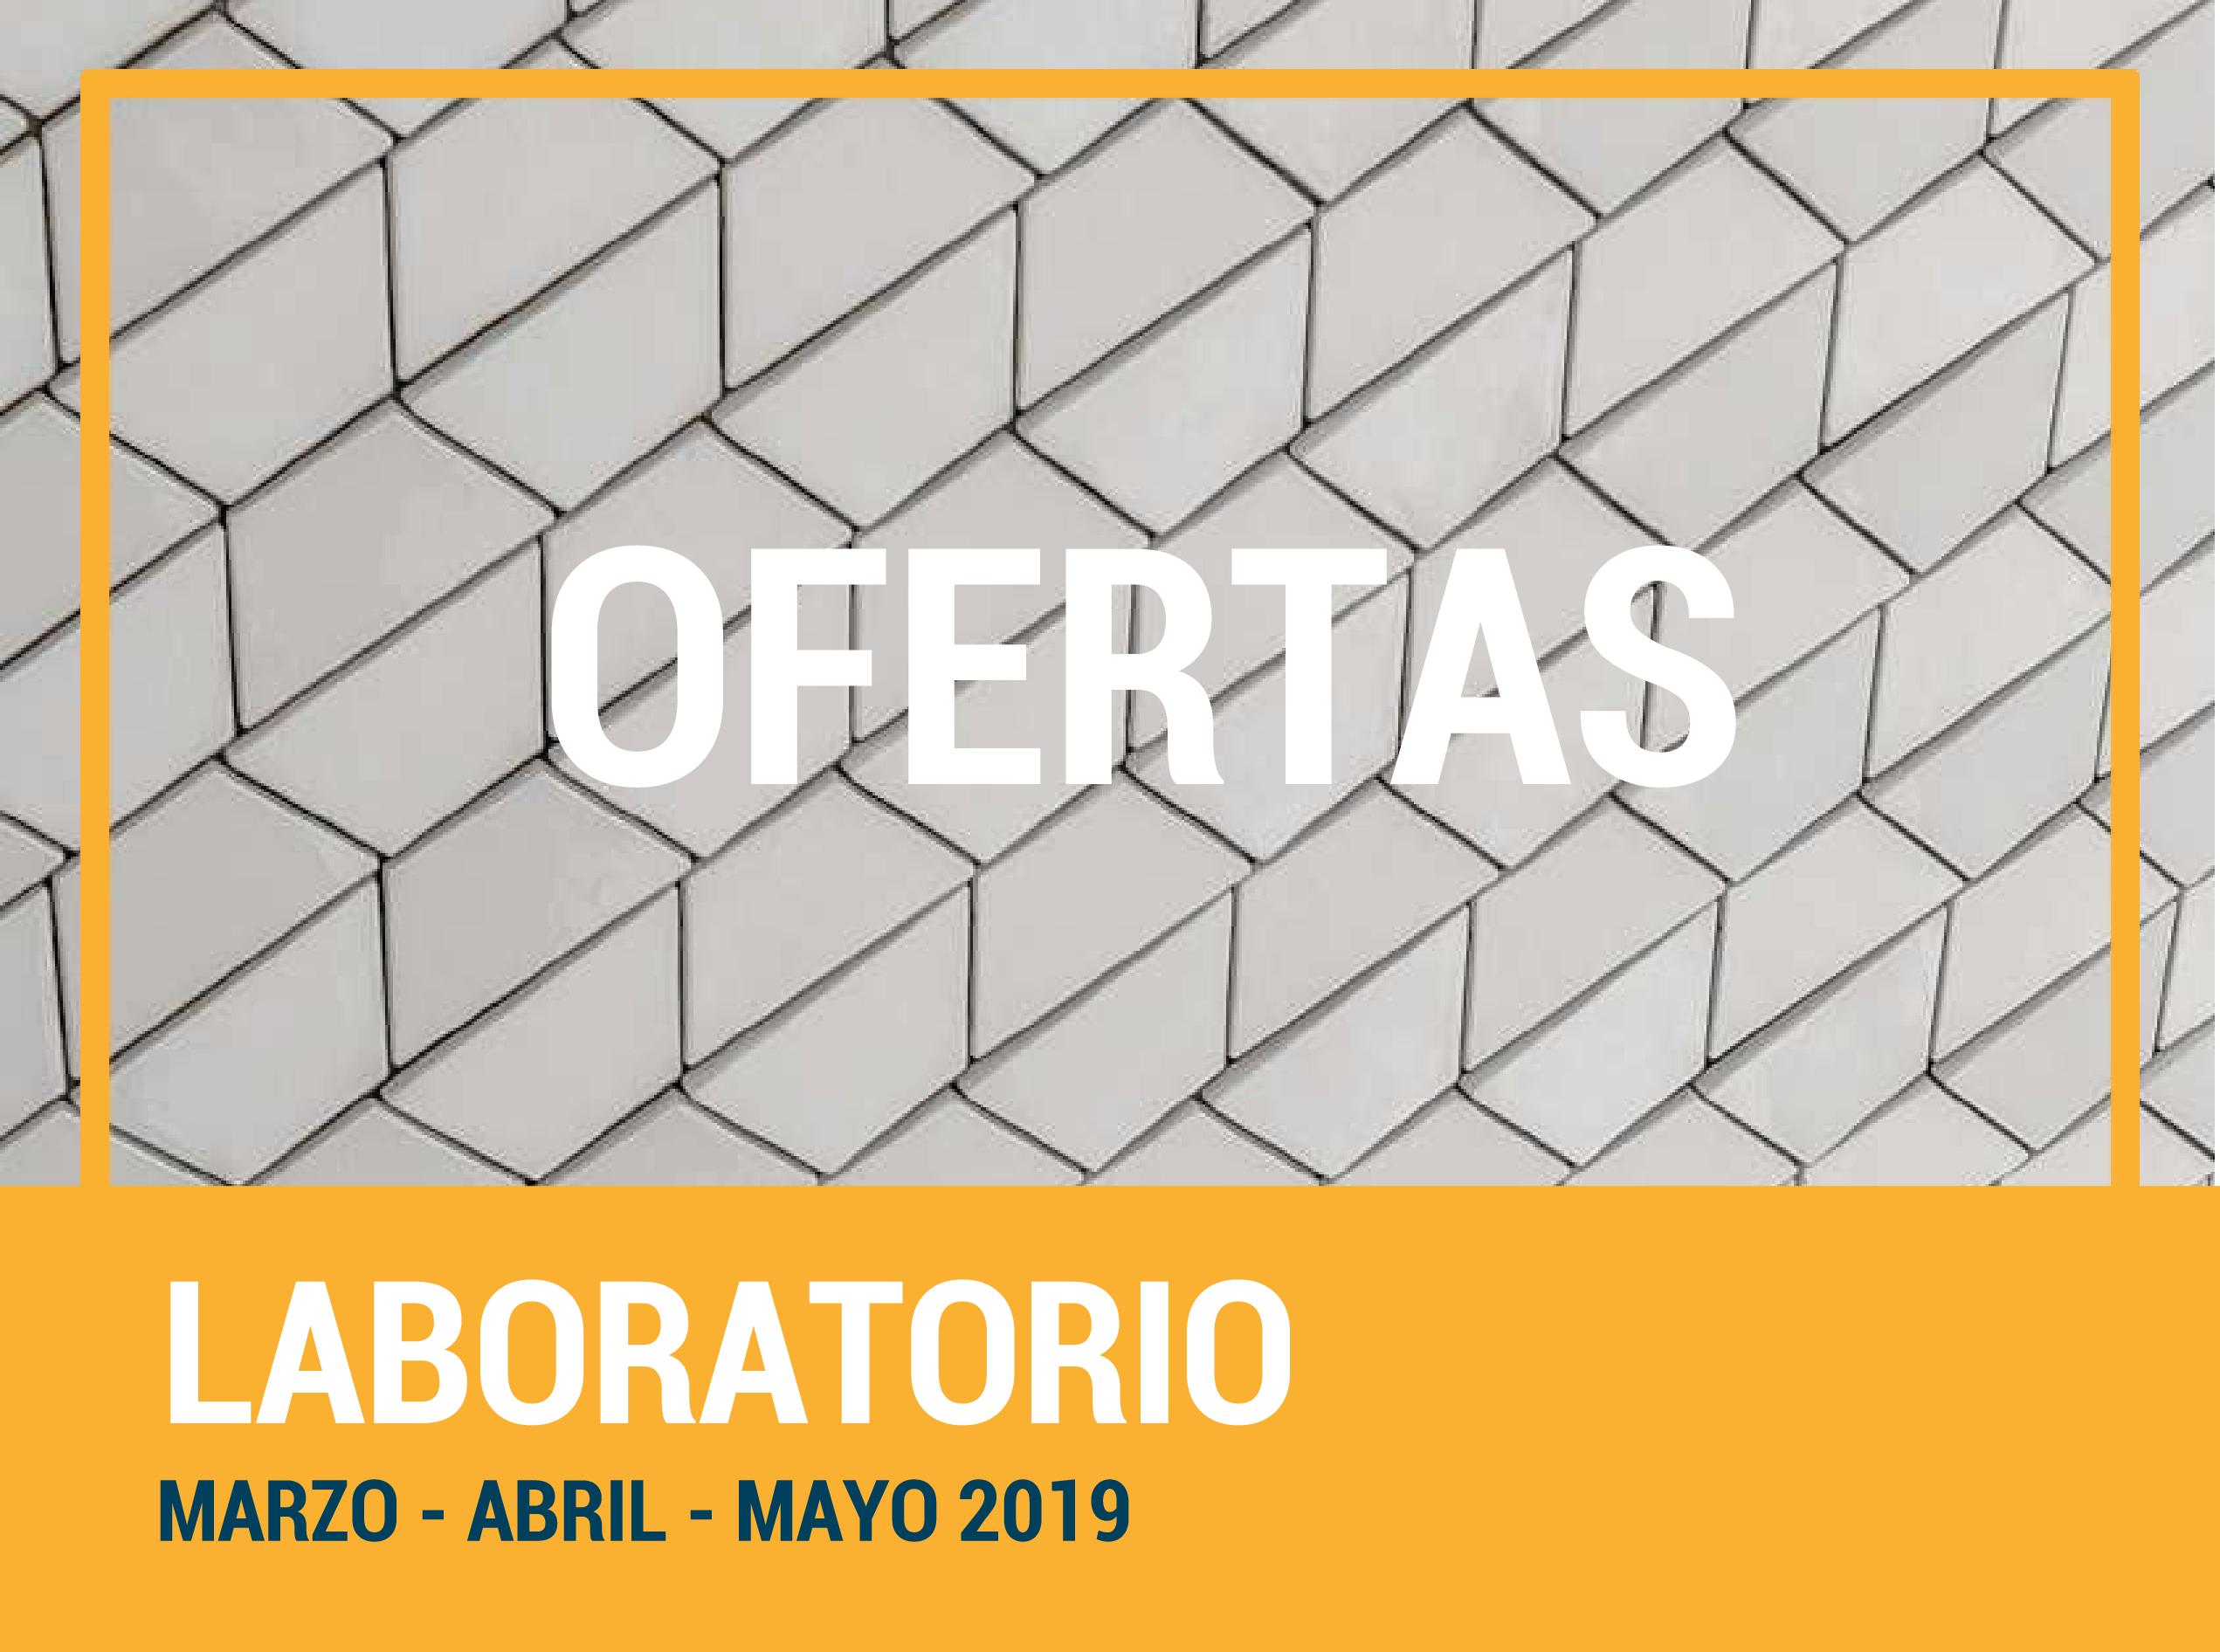 Laboratorio Mar-May 2019